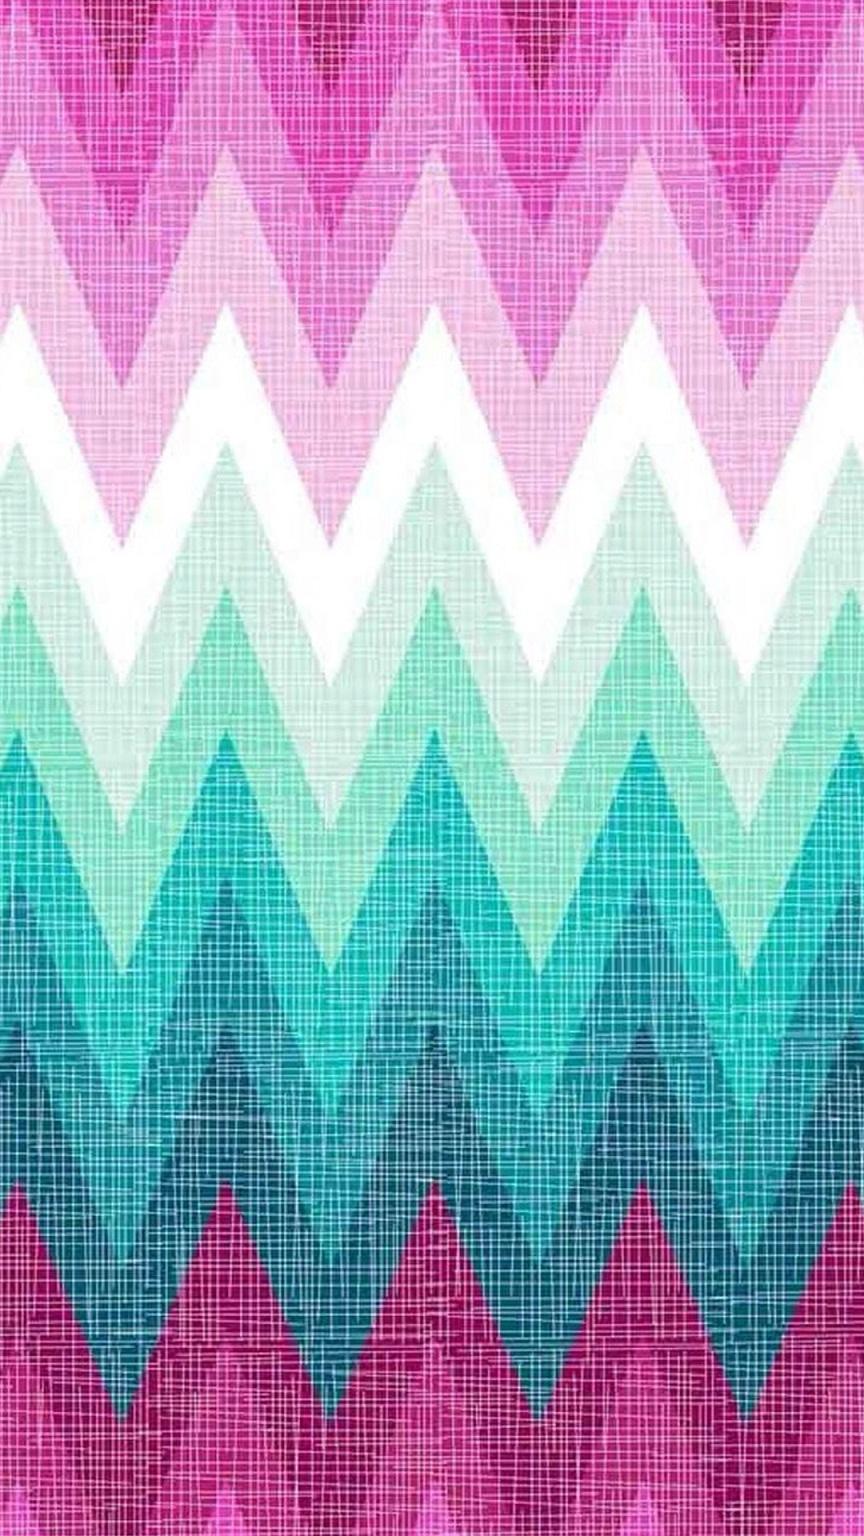 chevron style wallpaper - photo #8